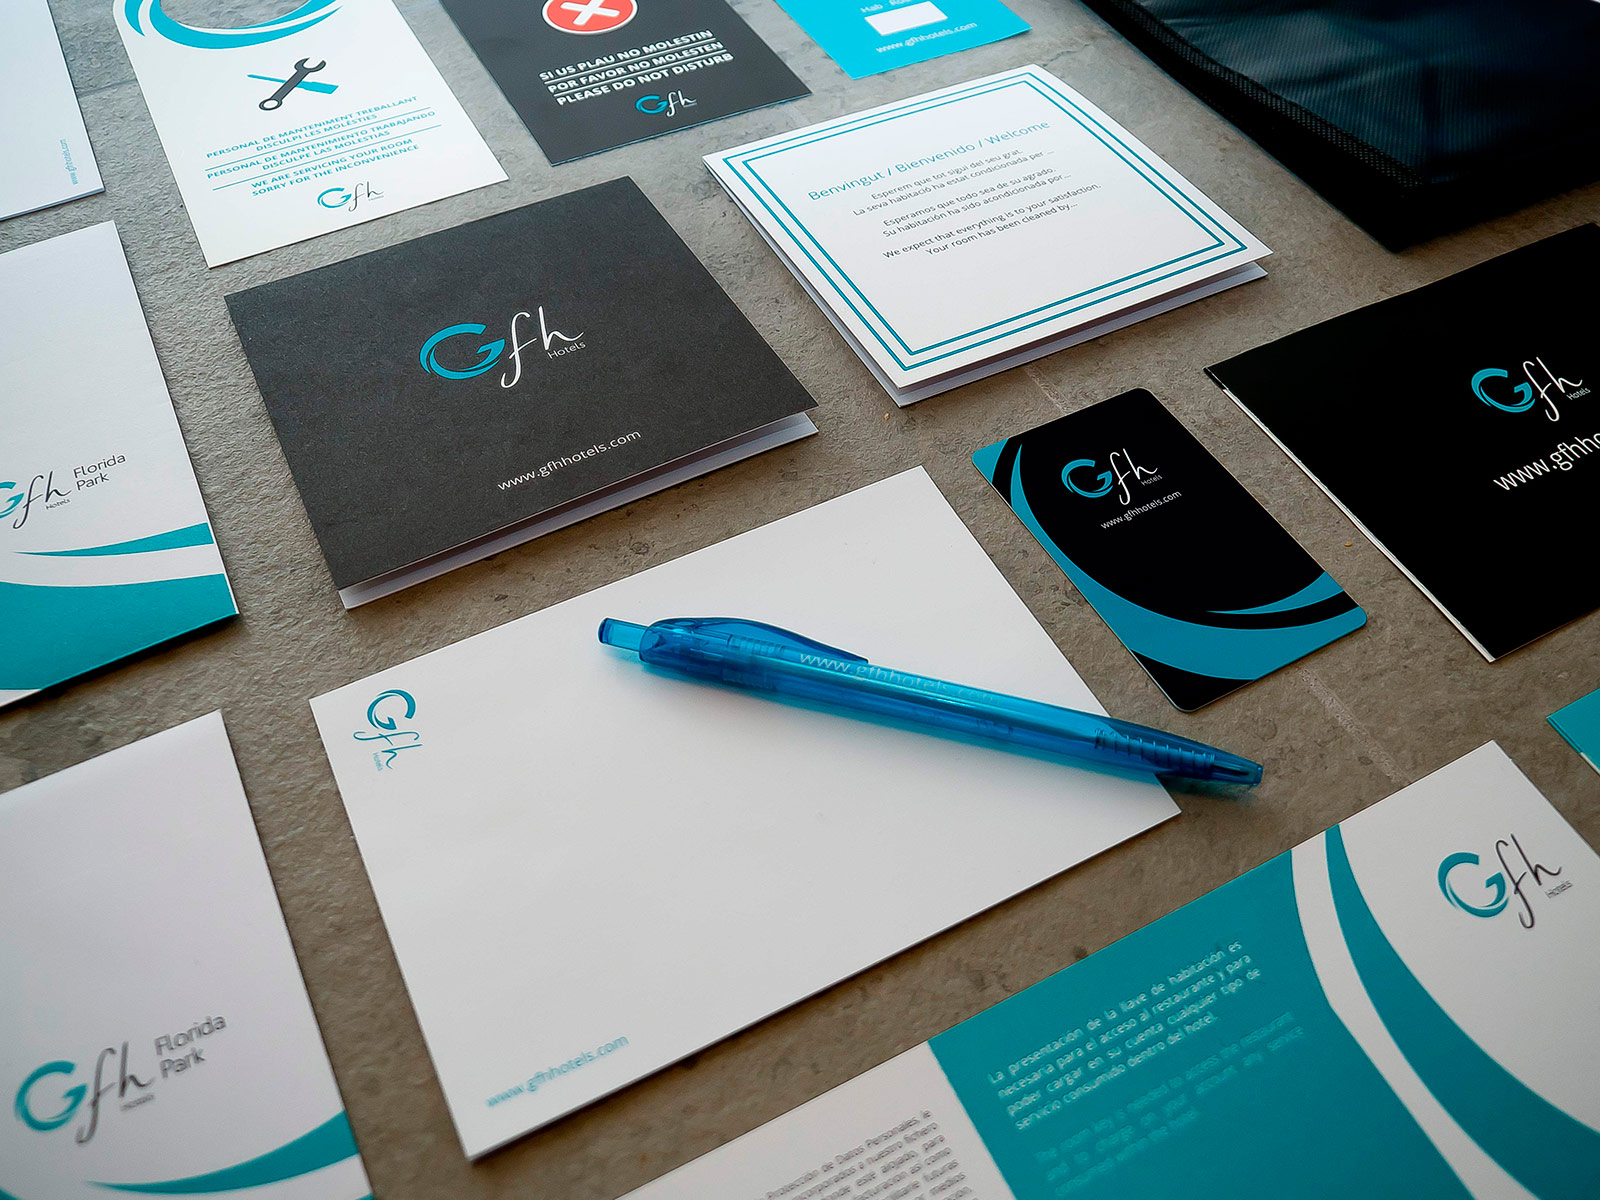 diseño grafico  Identidad corporativa     11